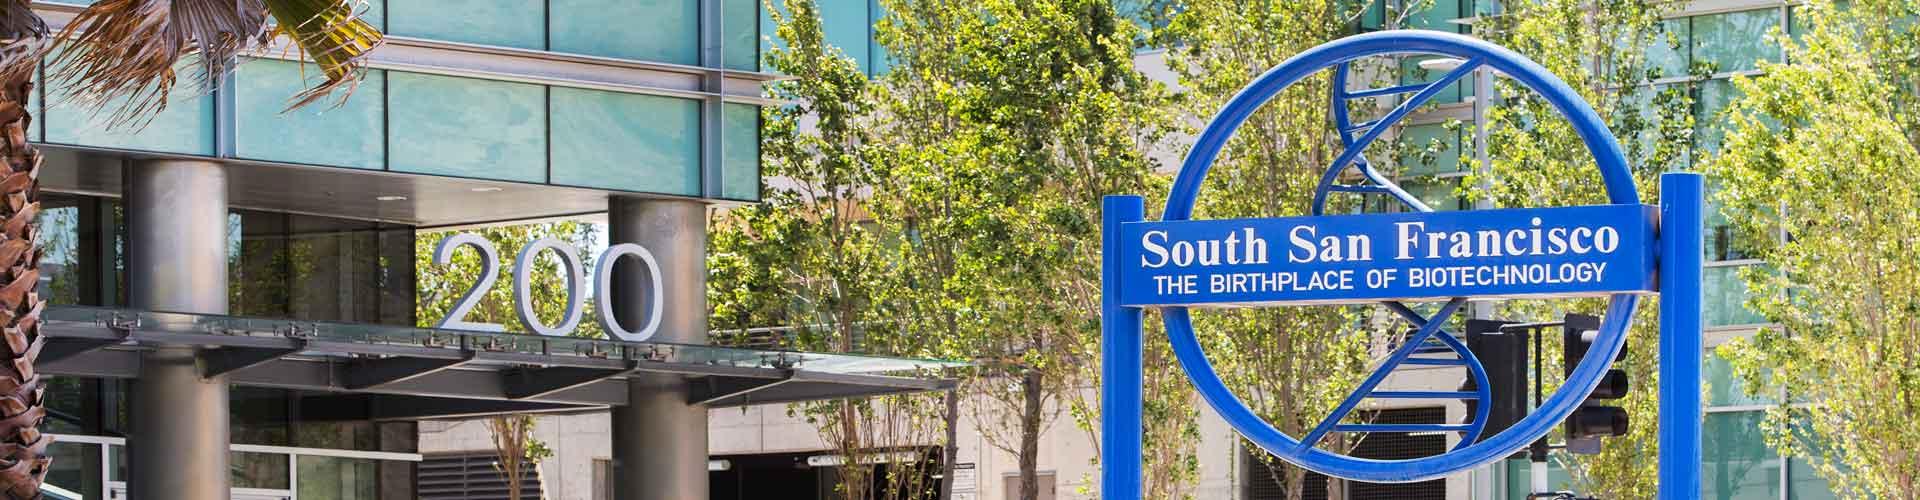 City of South San Francisco | Home